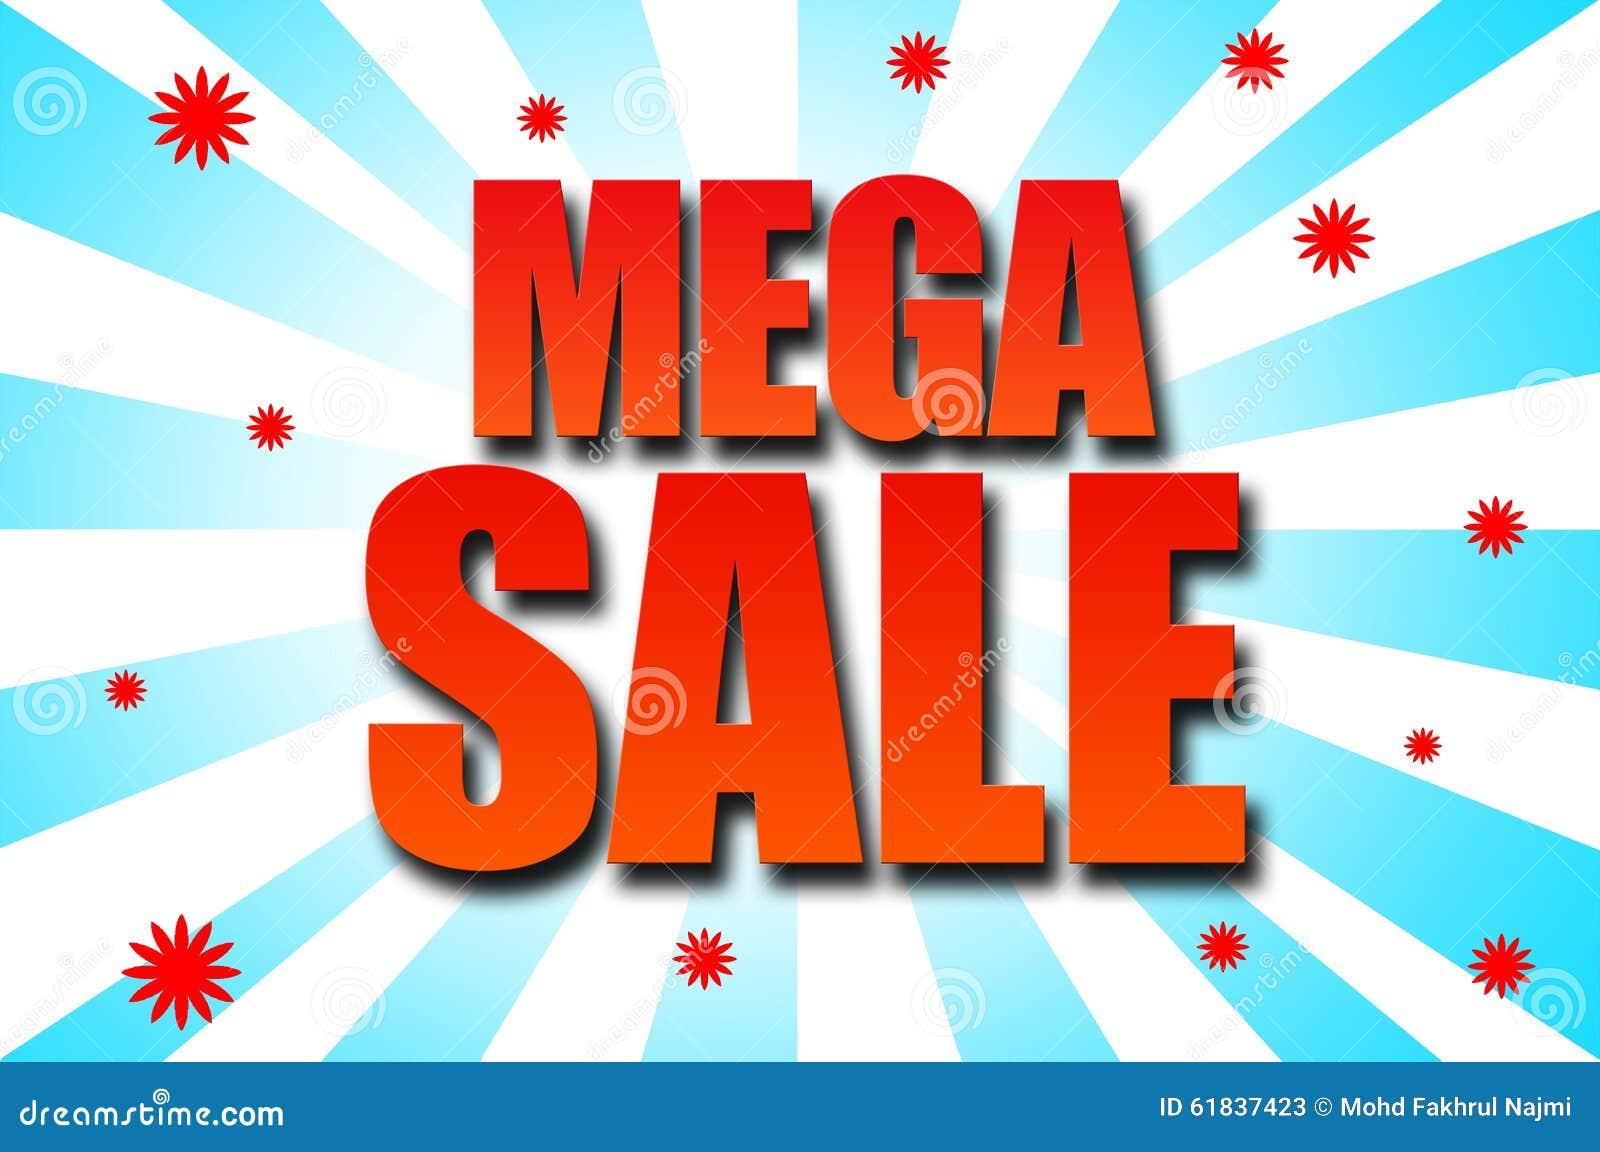 mega template design stock illustration image  mega template design